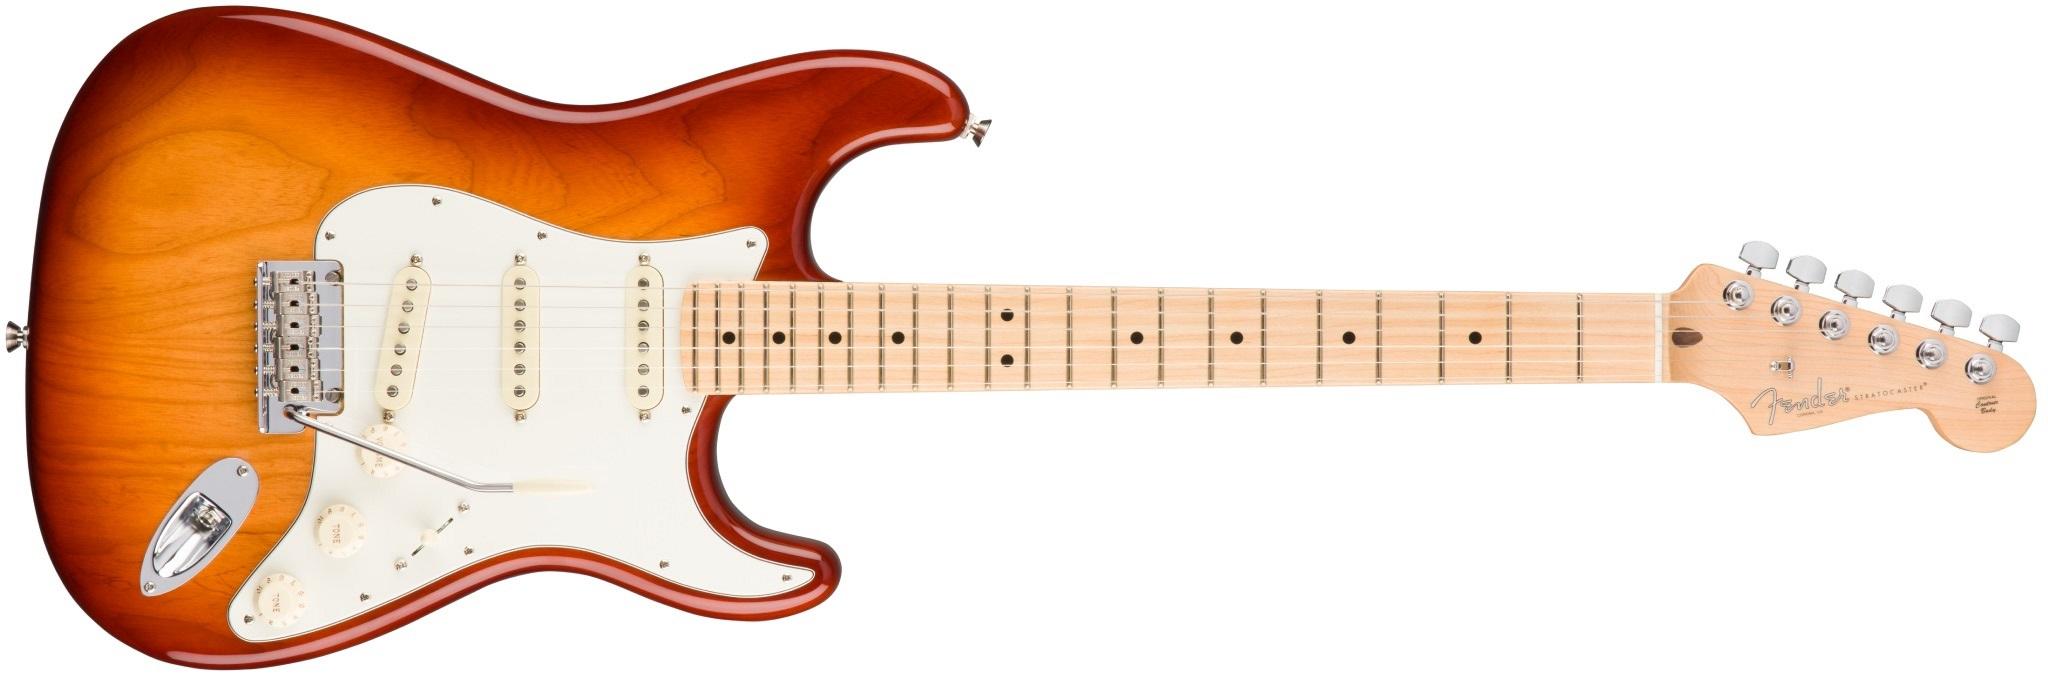 Fender American Pro Stratocaster MN SSB ASH